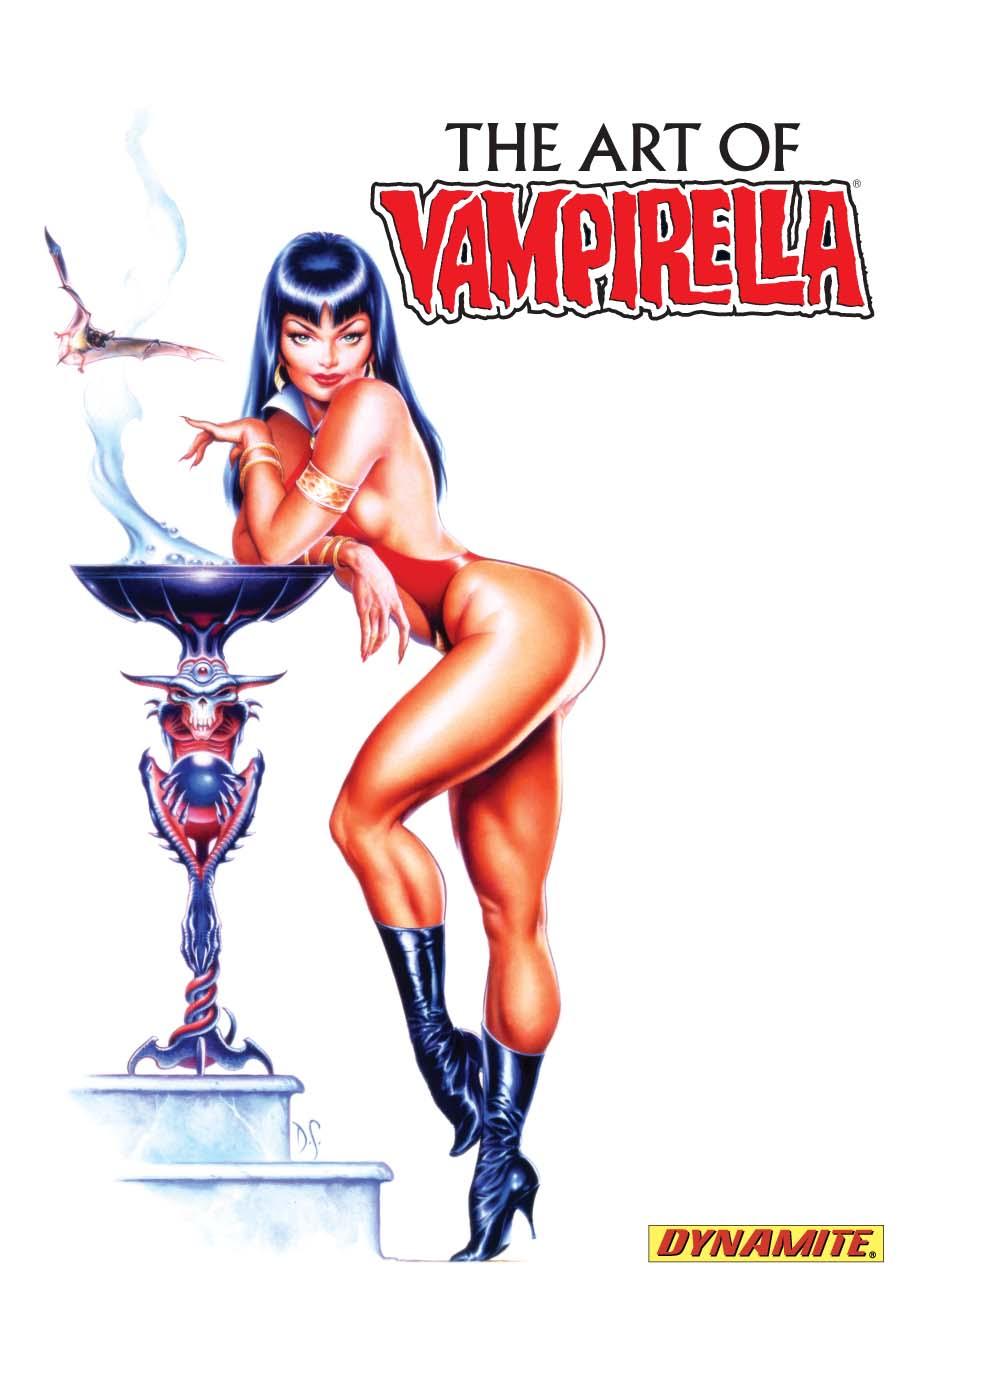 ArtOfVampirellaSelfCover VAMPIRELLA #5 guest stars Dracula in March